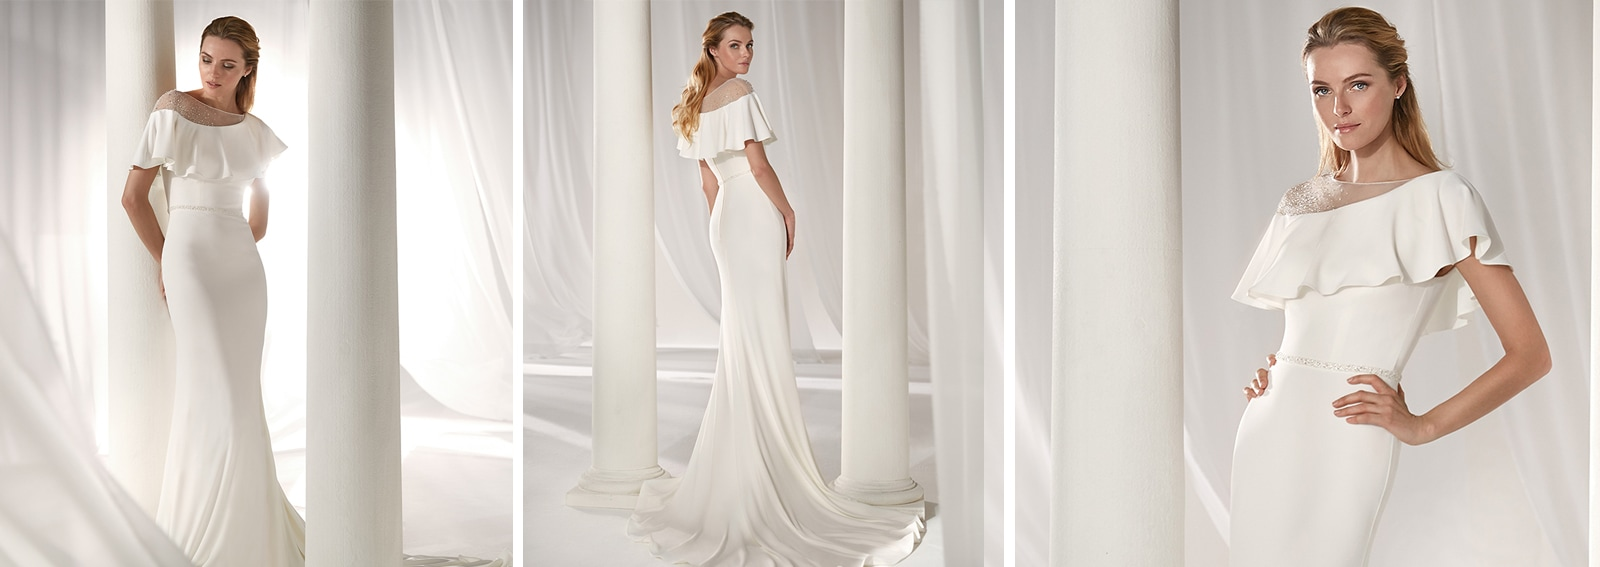 sposa-sirena-ok_DESK